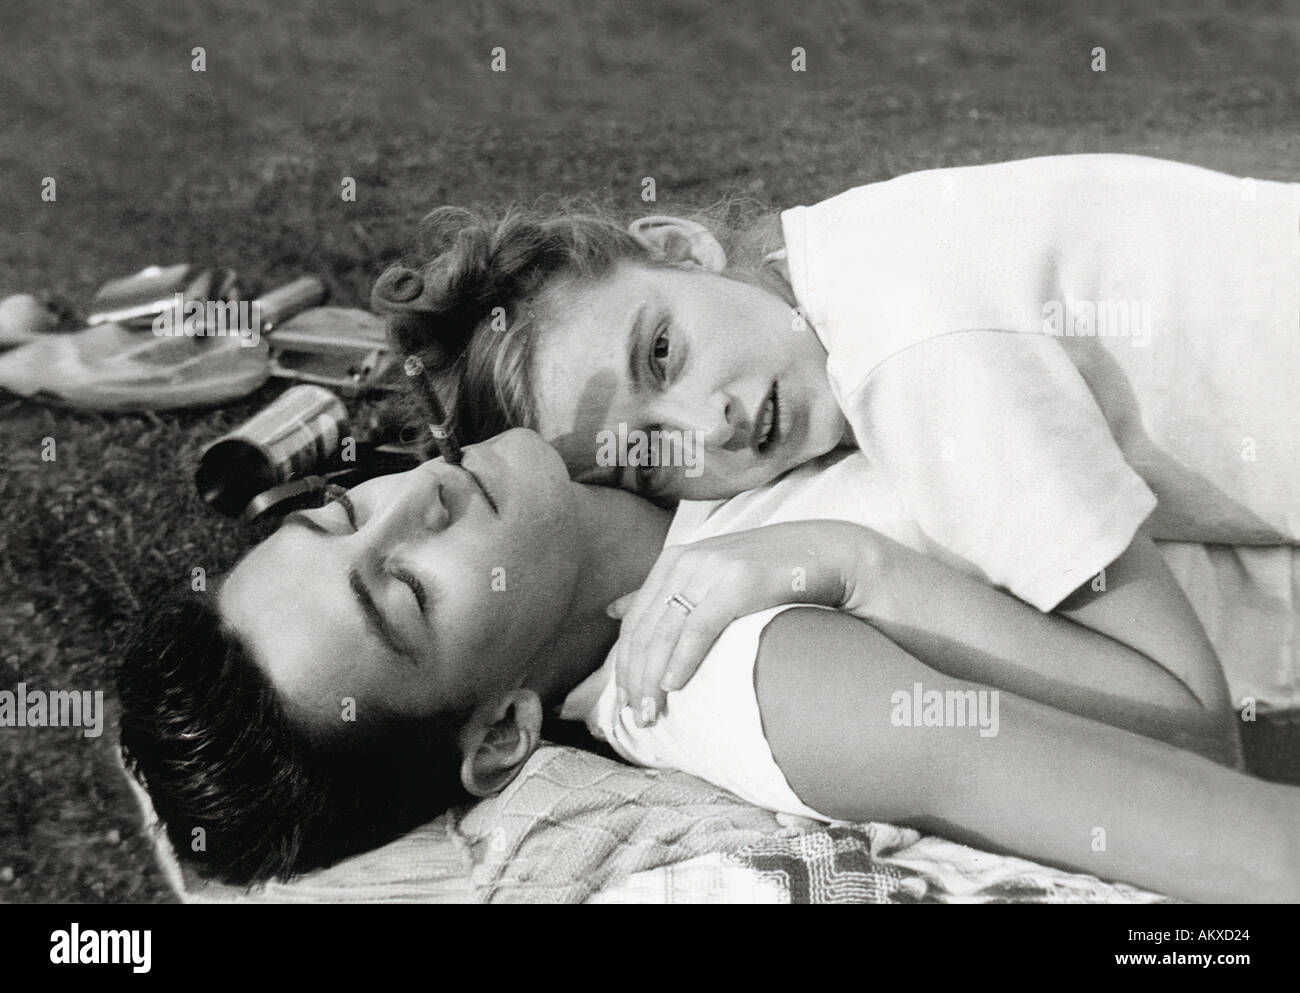 Retro young couple. - Stock Image